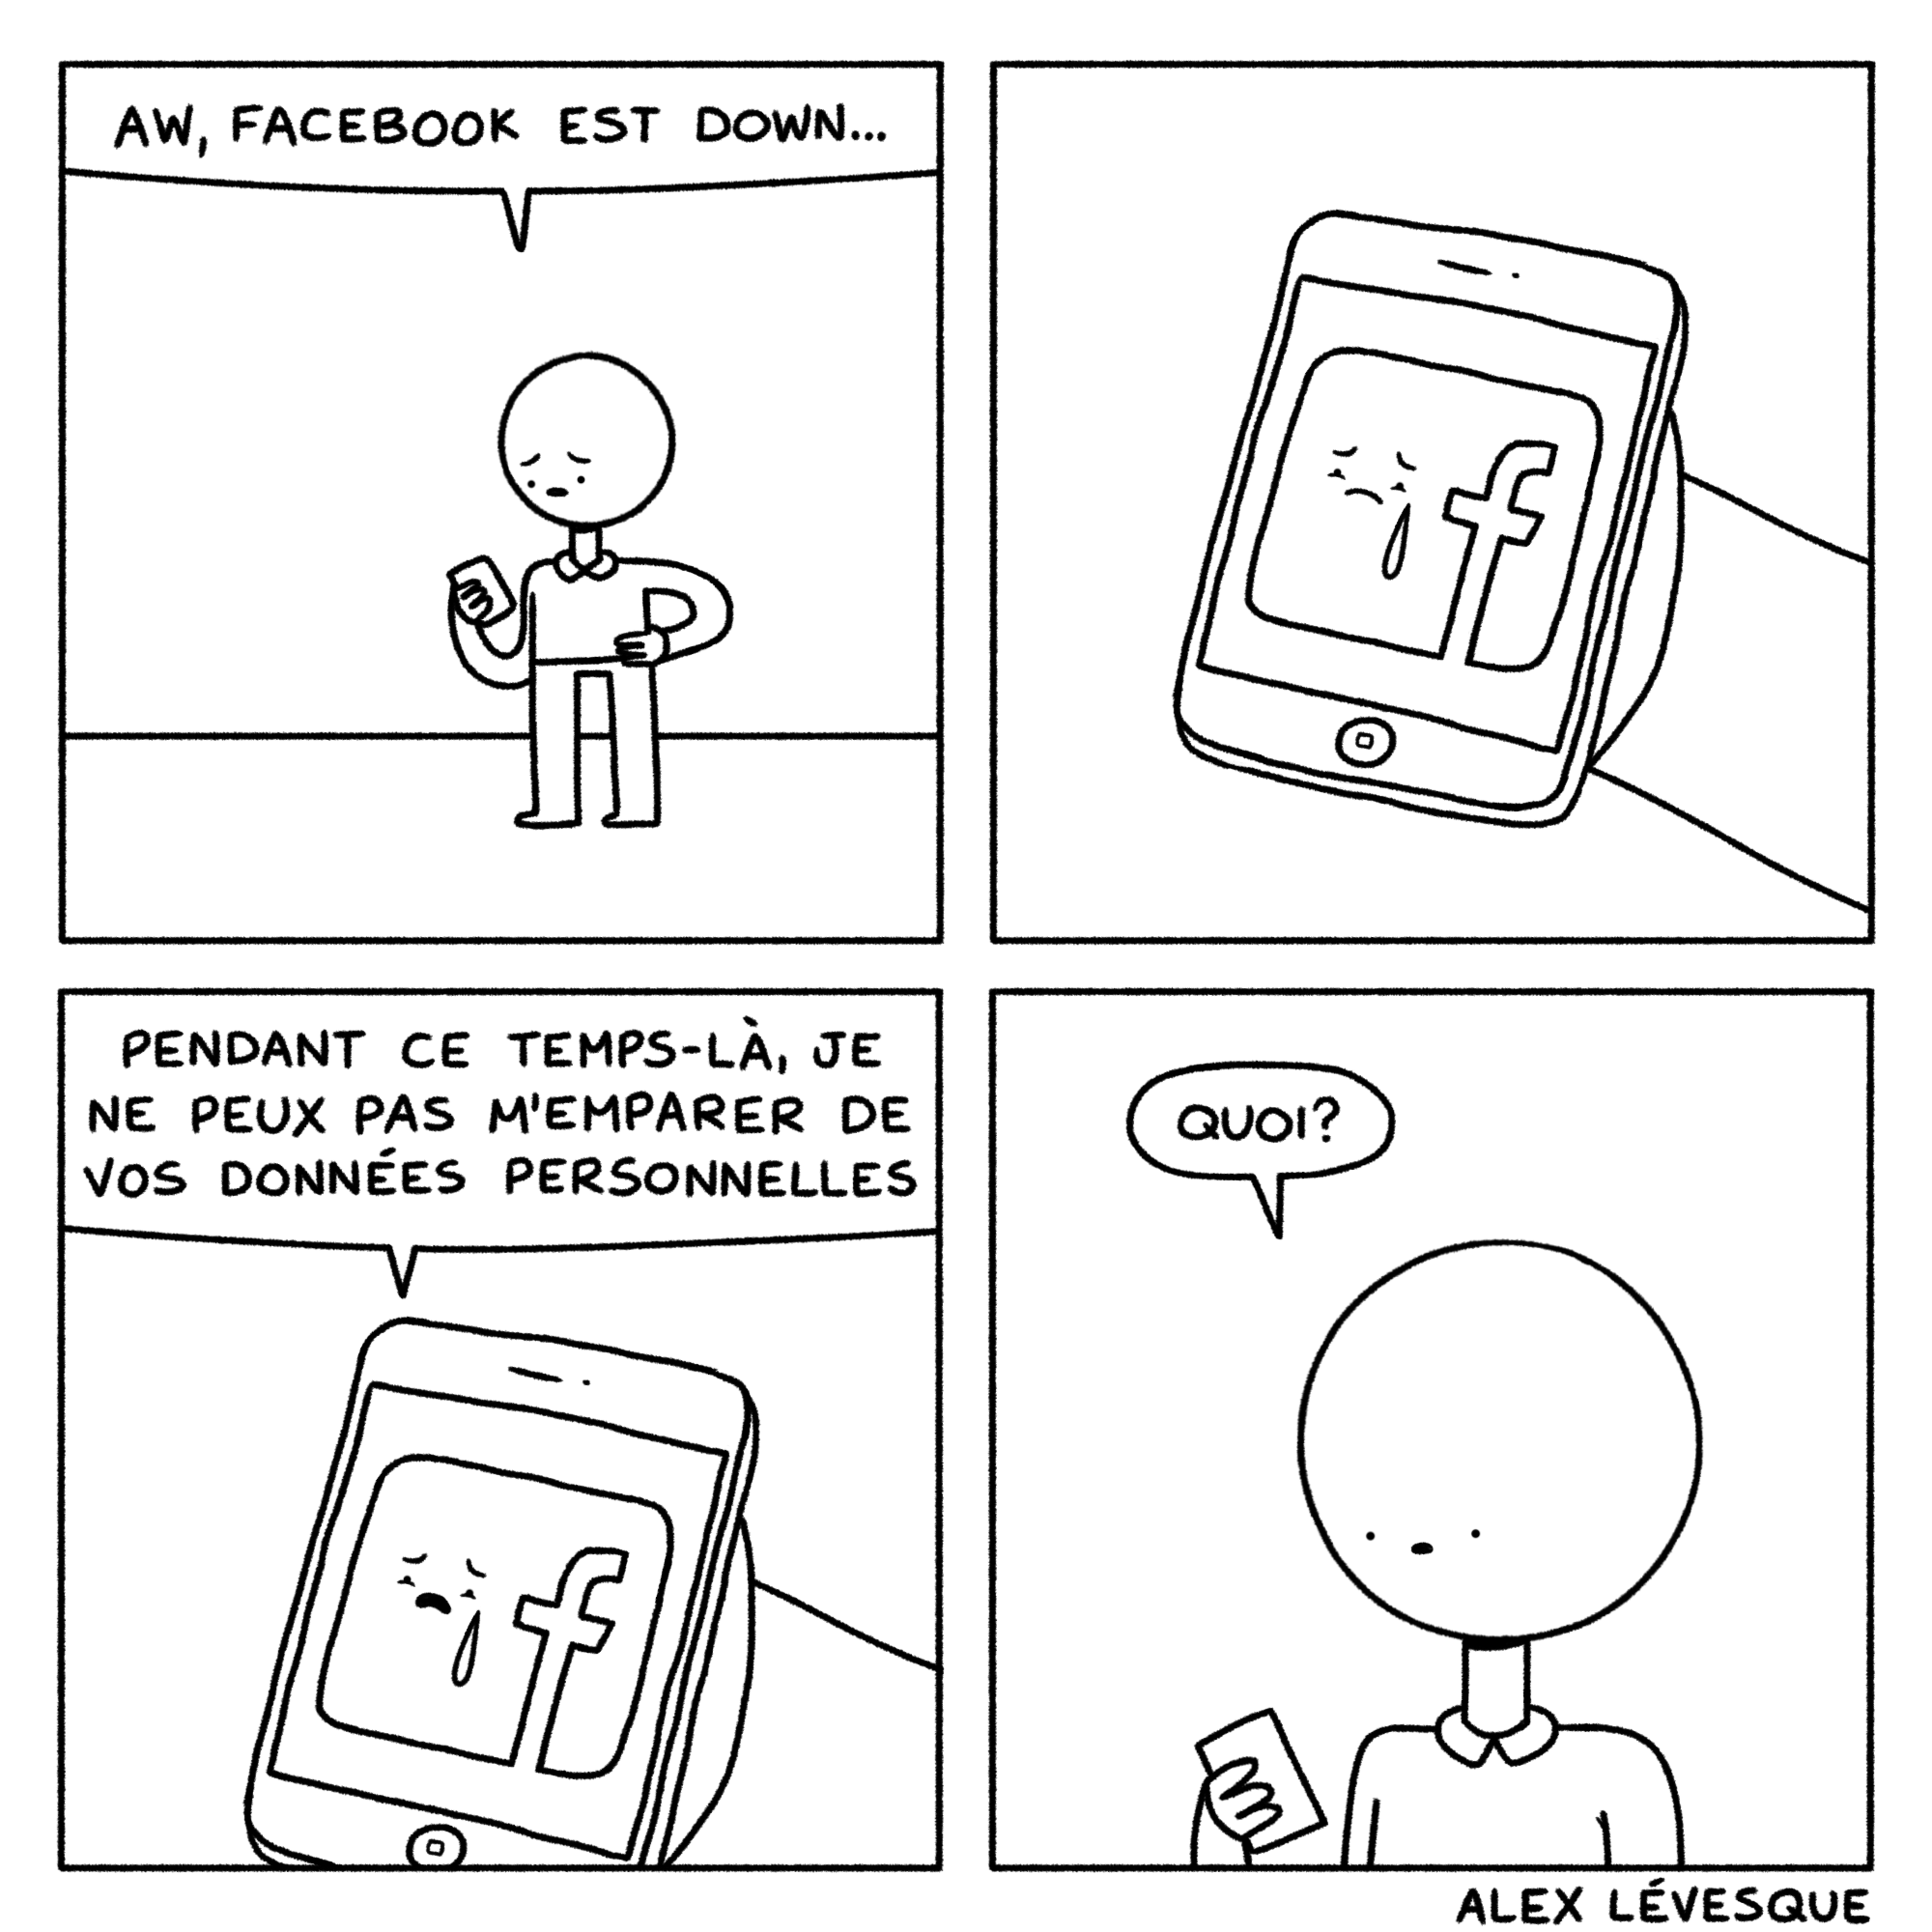 Facebook est down